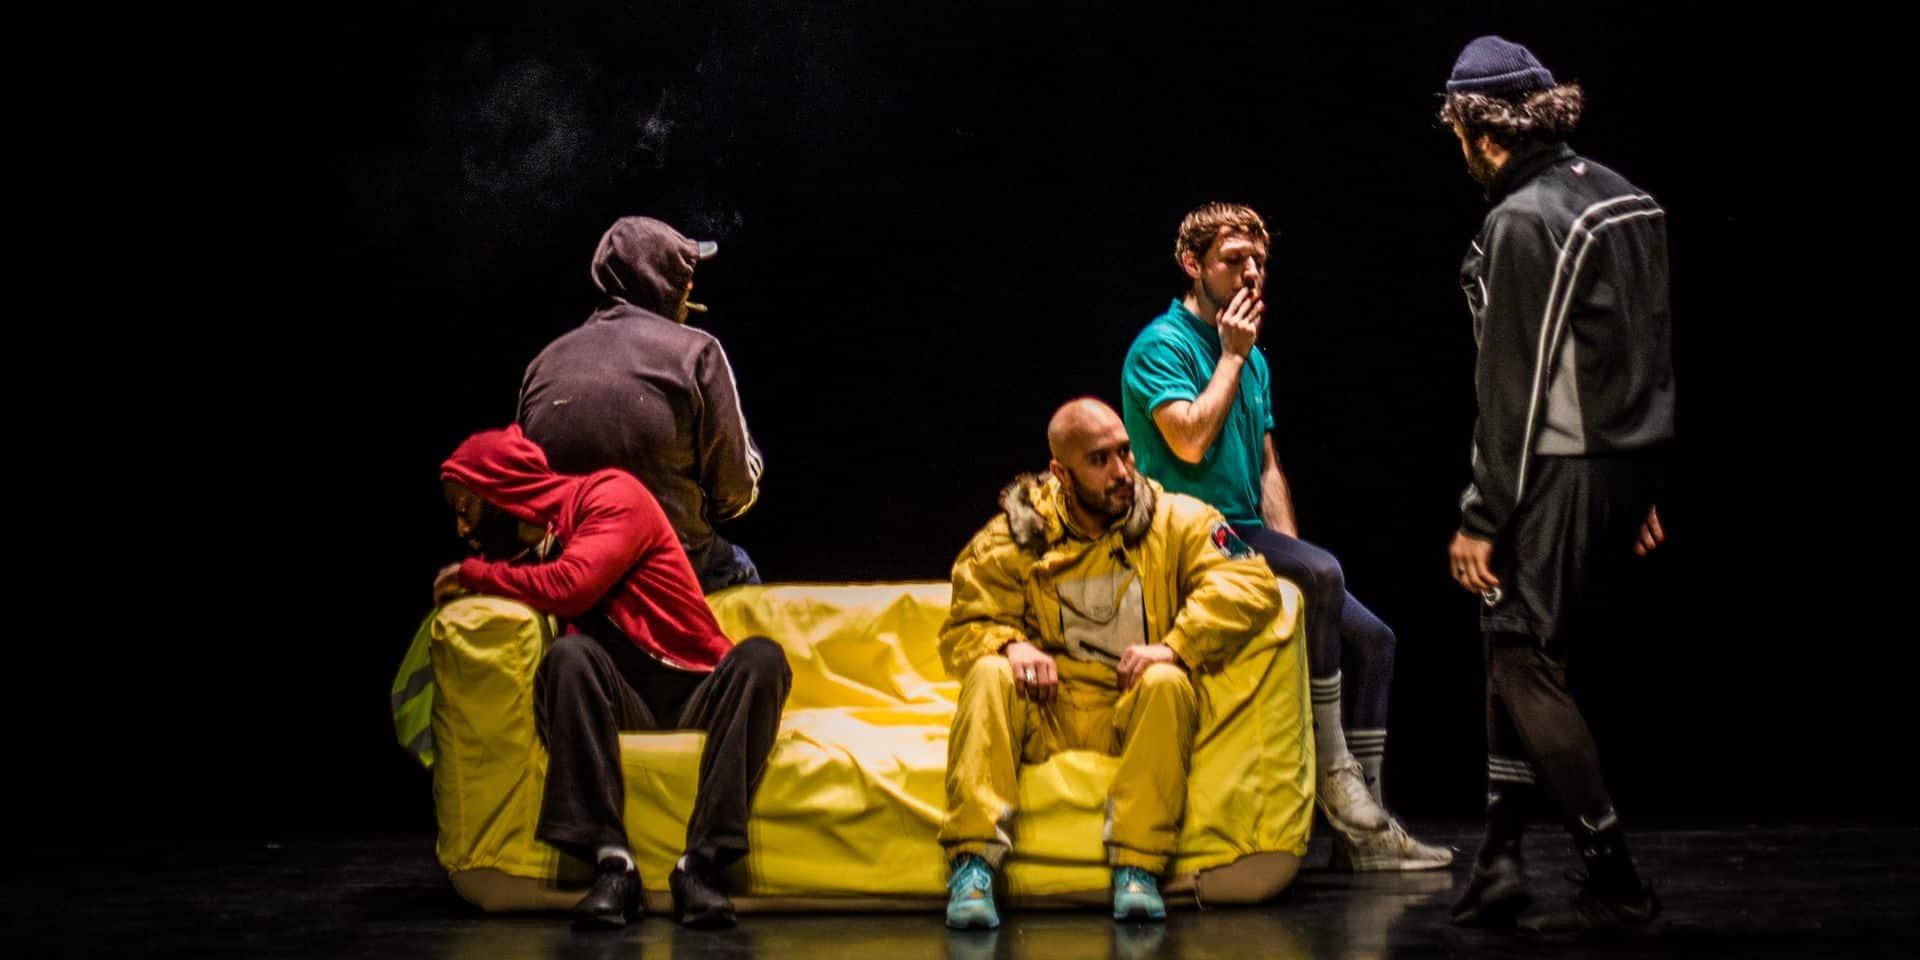 """Ouragan"", une pièce intime qui dénonce la violence normative"